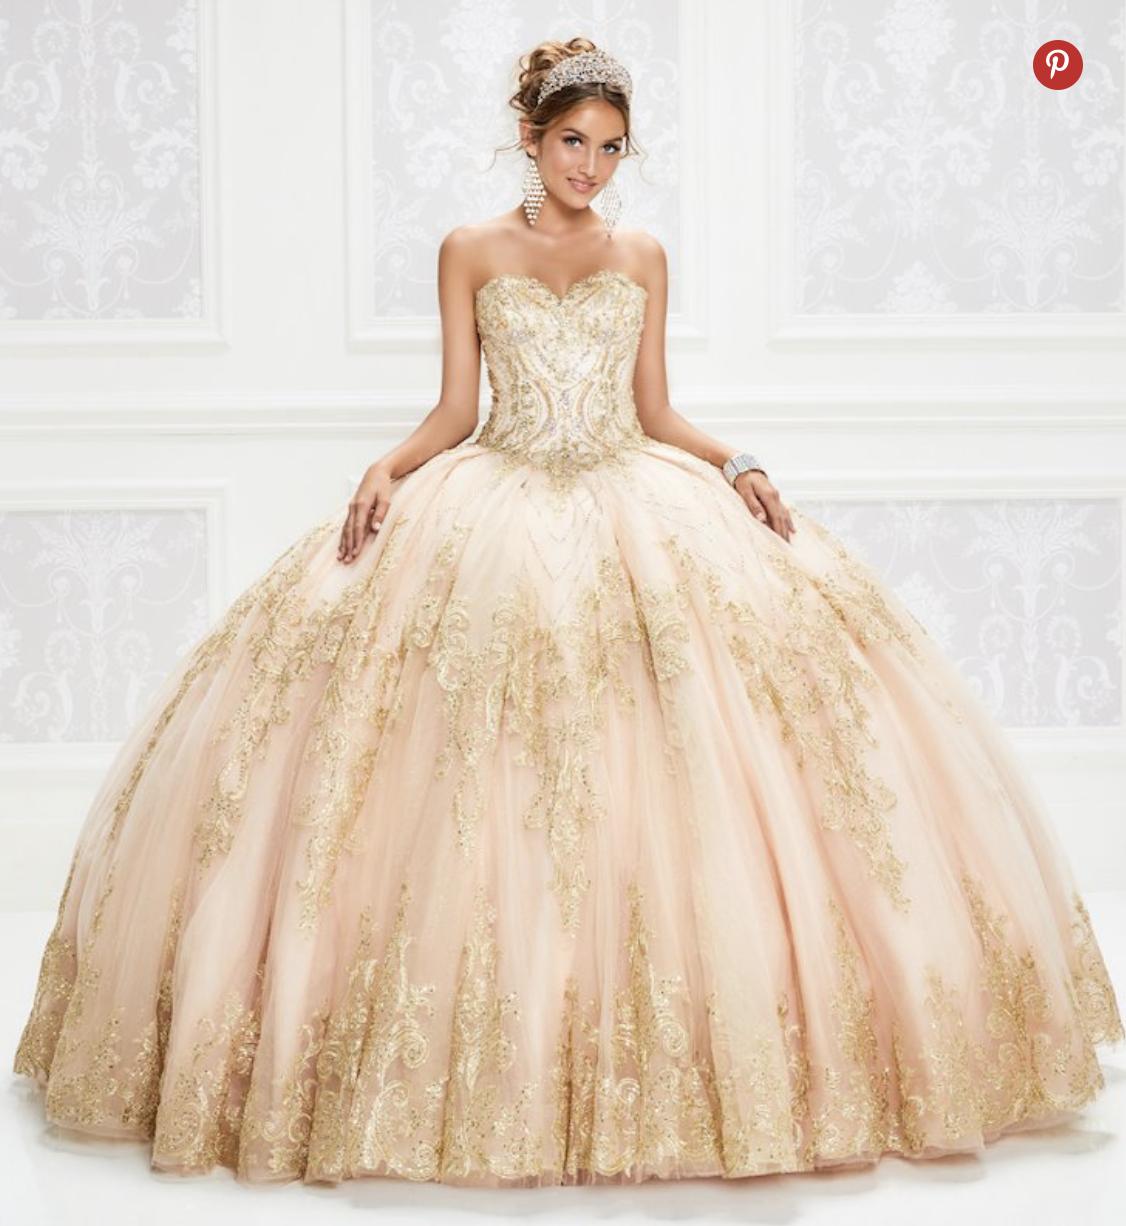 Princesa By Ariana Vara PR12015